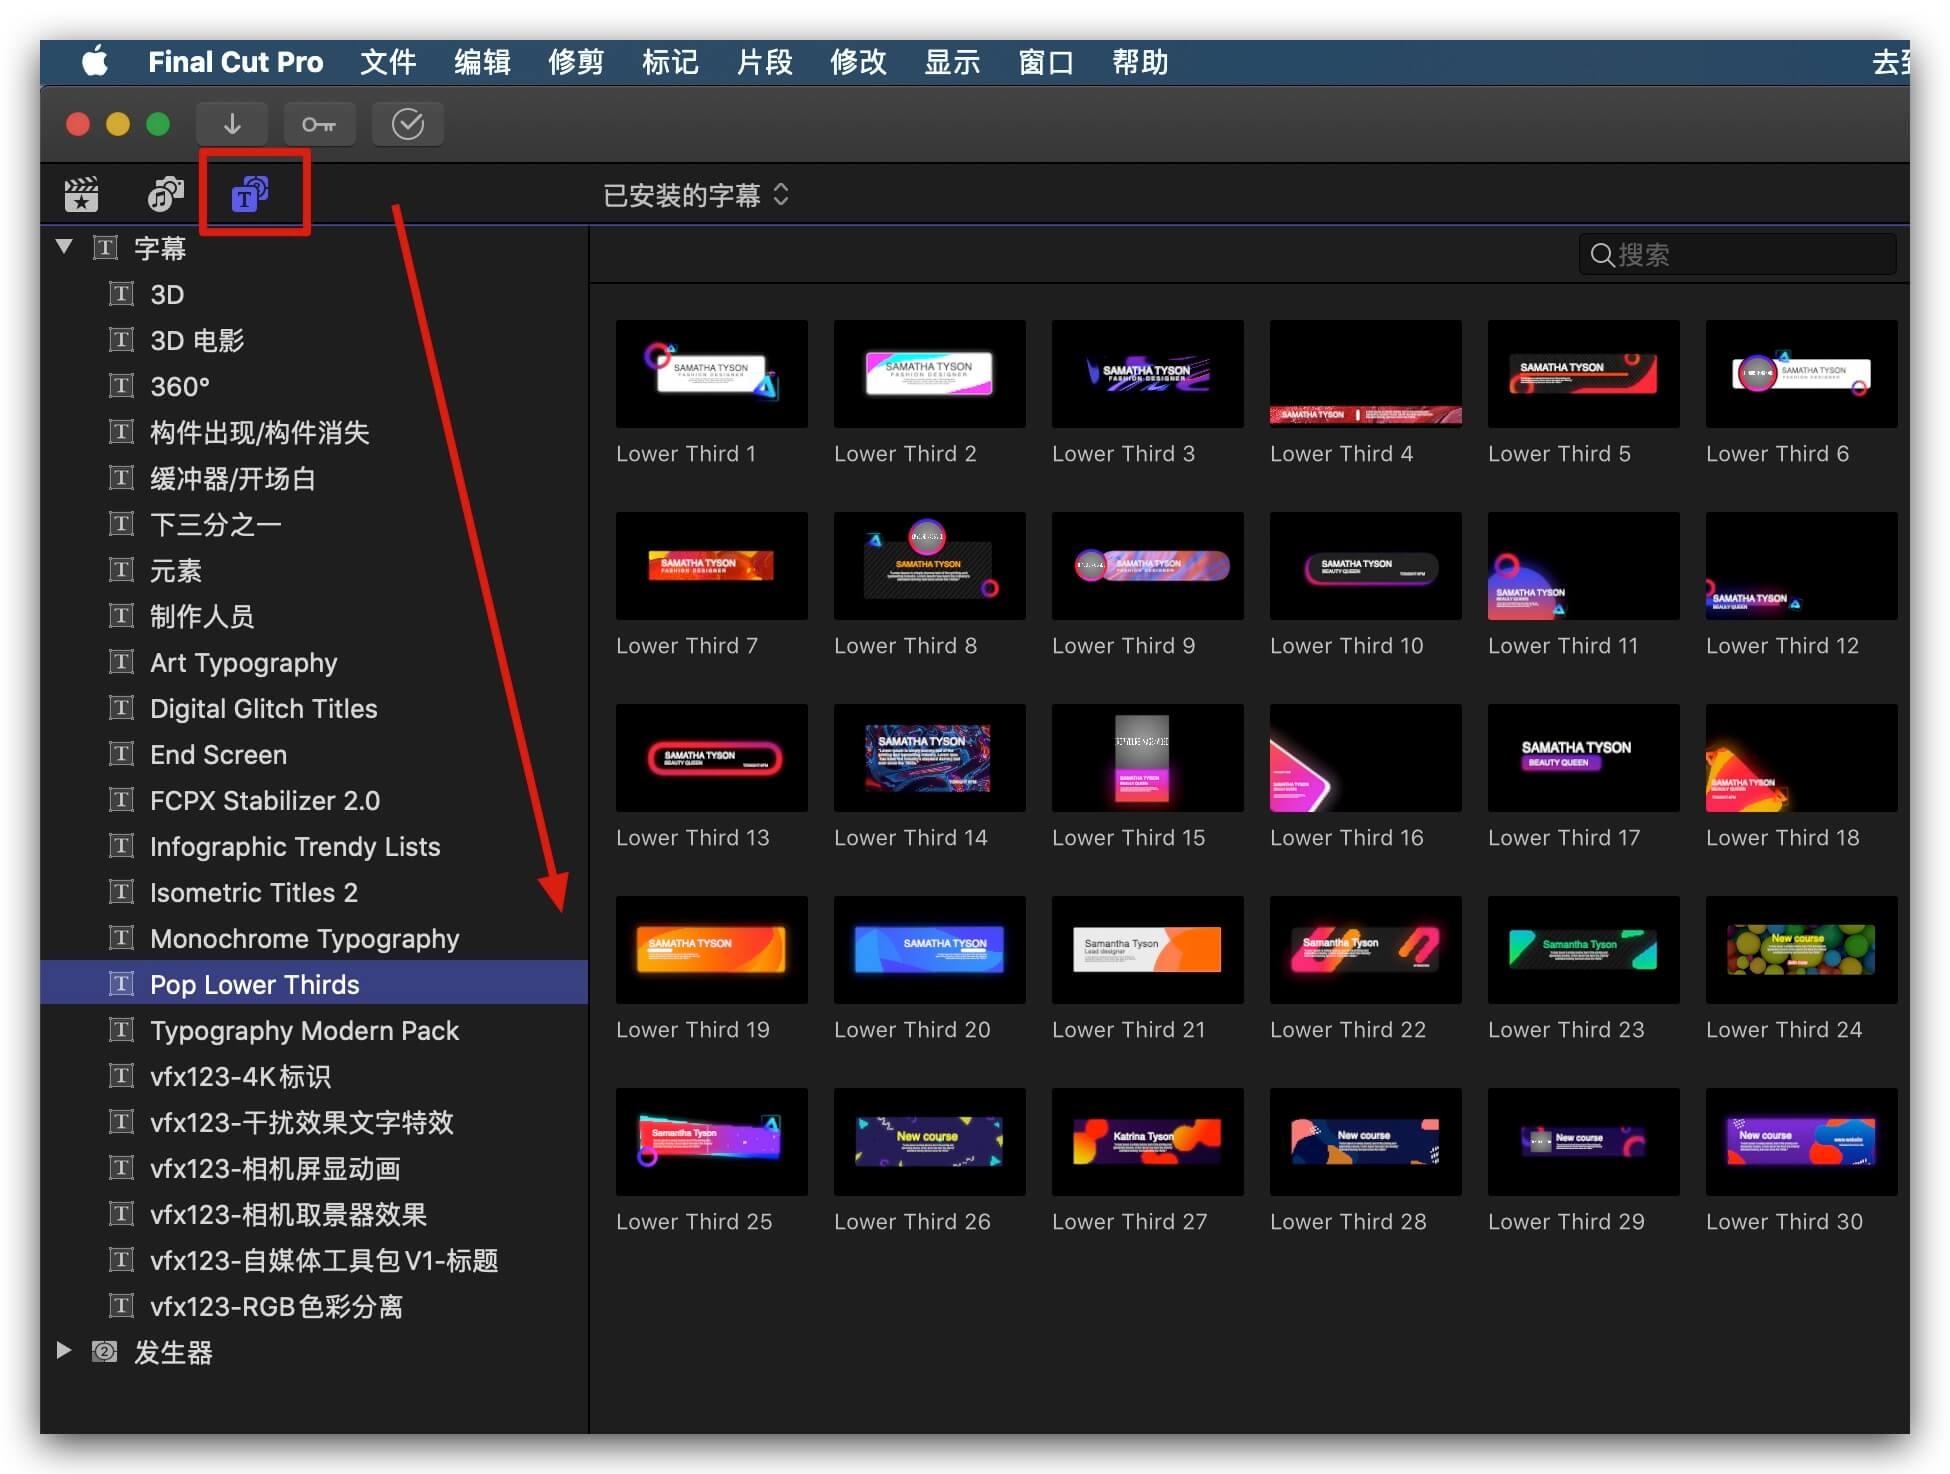 fcpx插件 30组流行彩色Banner横幅样式字幕条模板 Pop Lower thirds